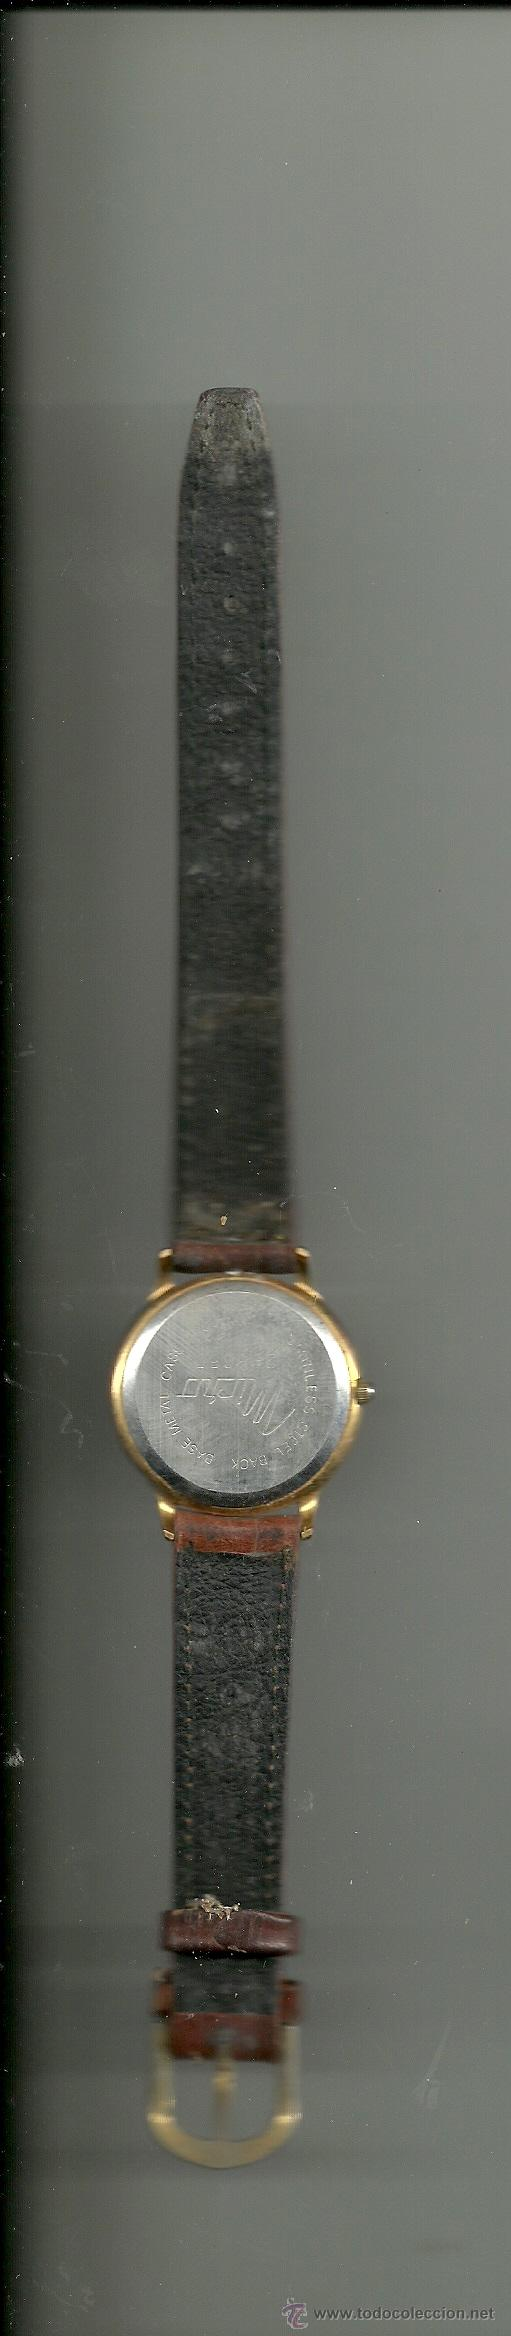 Relojes: OLIMPIADAS 92 RELOJ UNIDOS PARA SIEMPRE - Foto 2 - 54308290